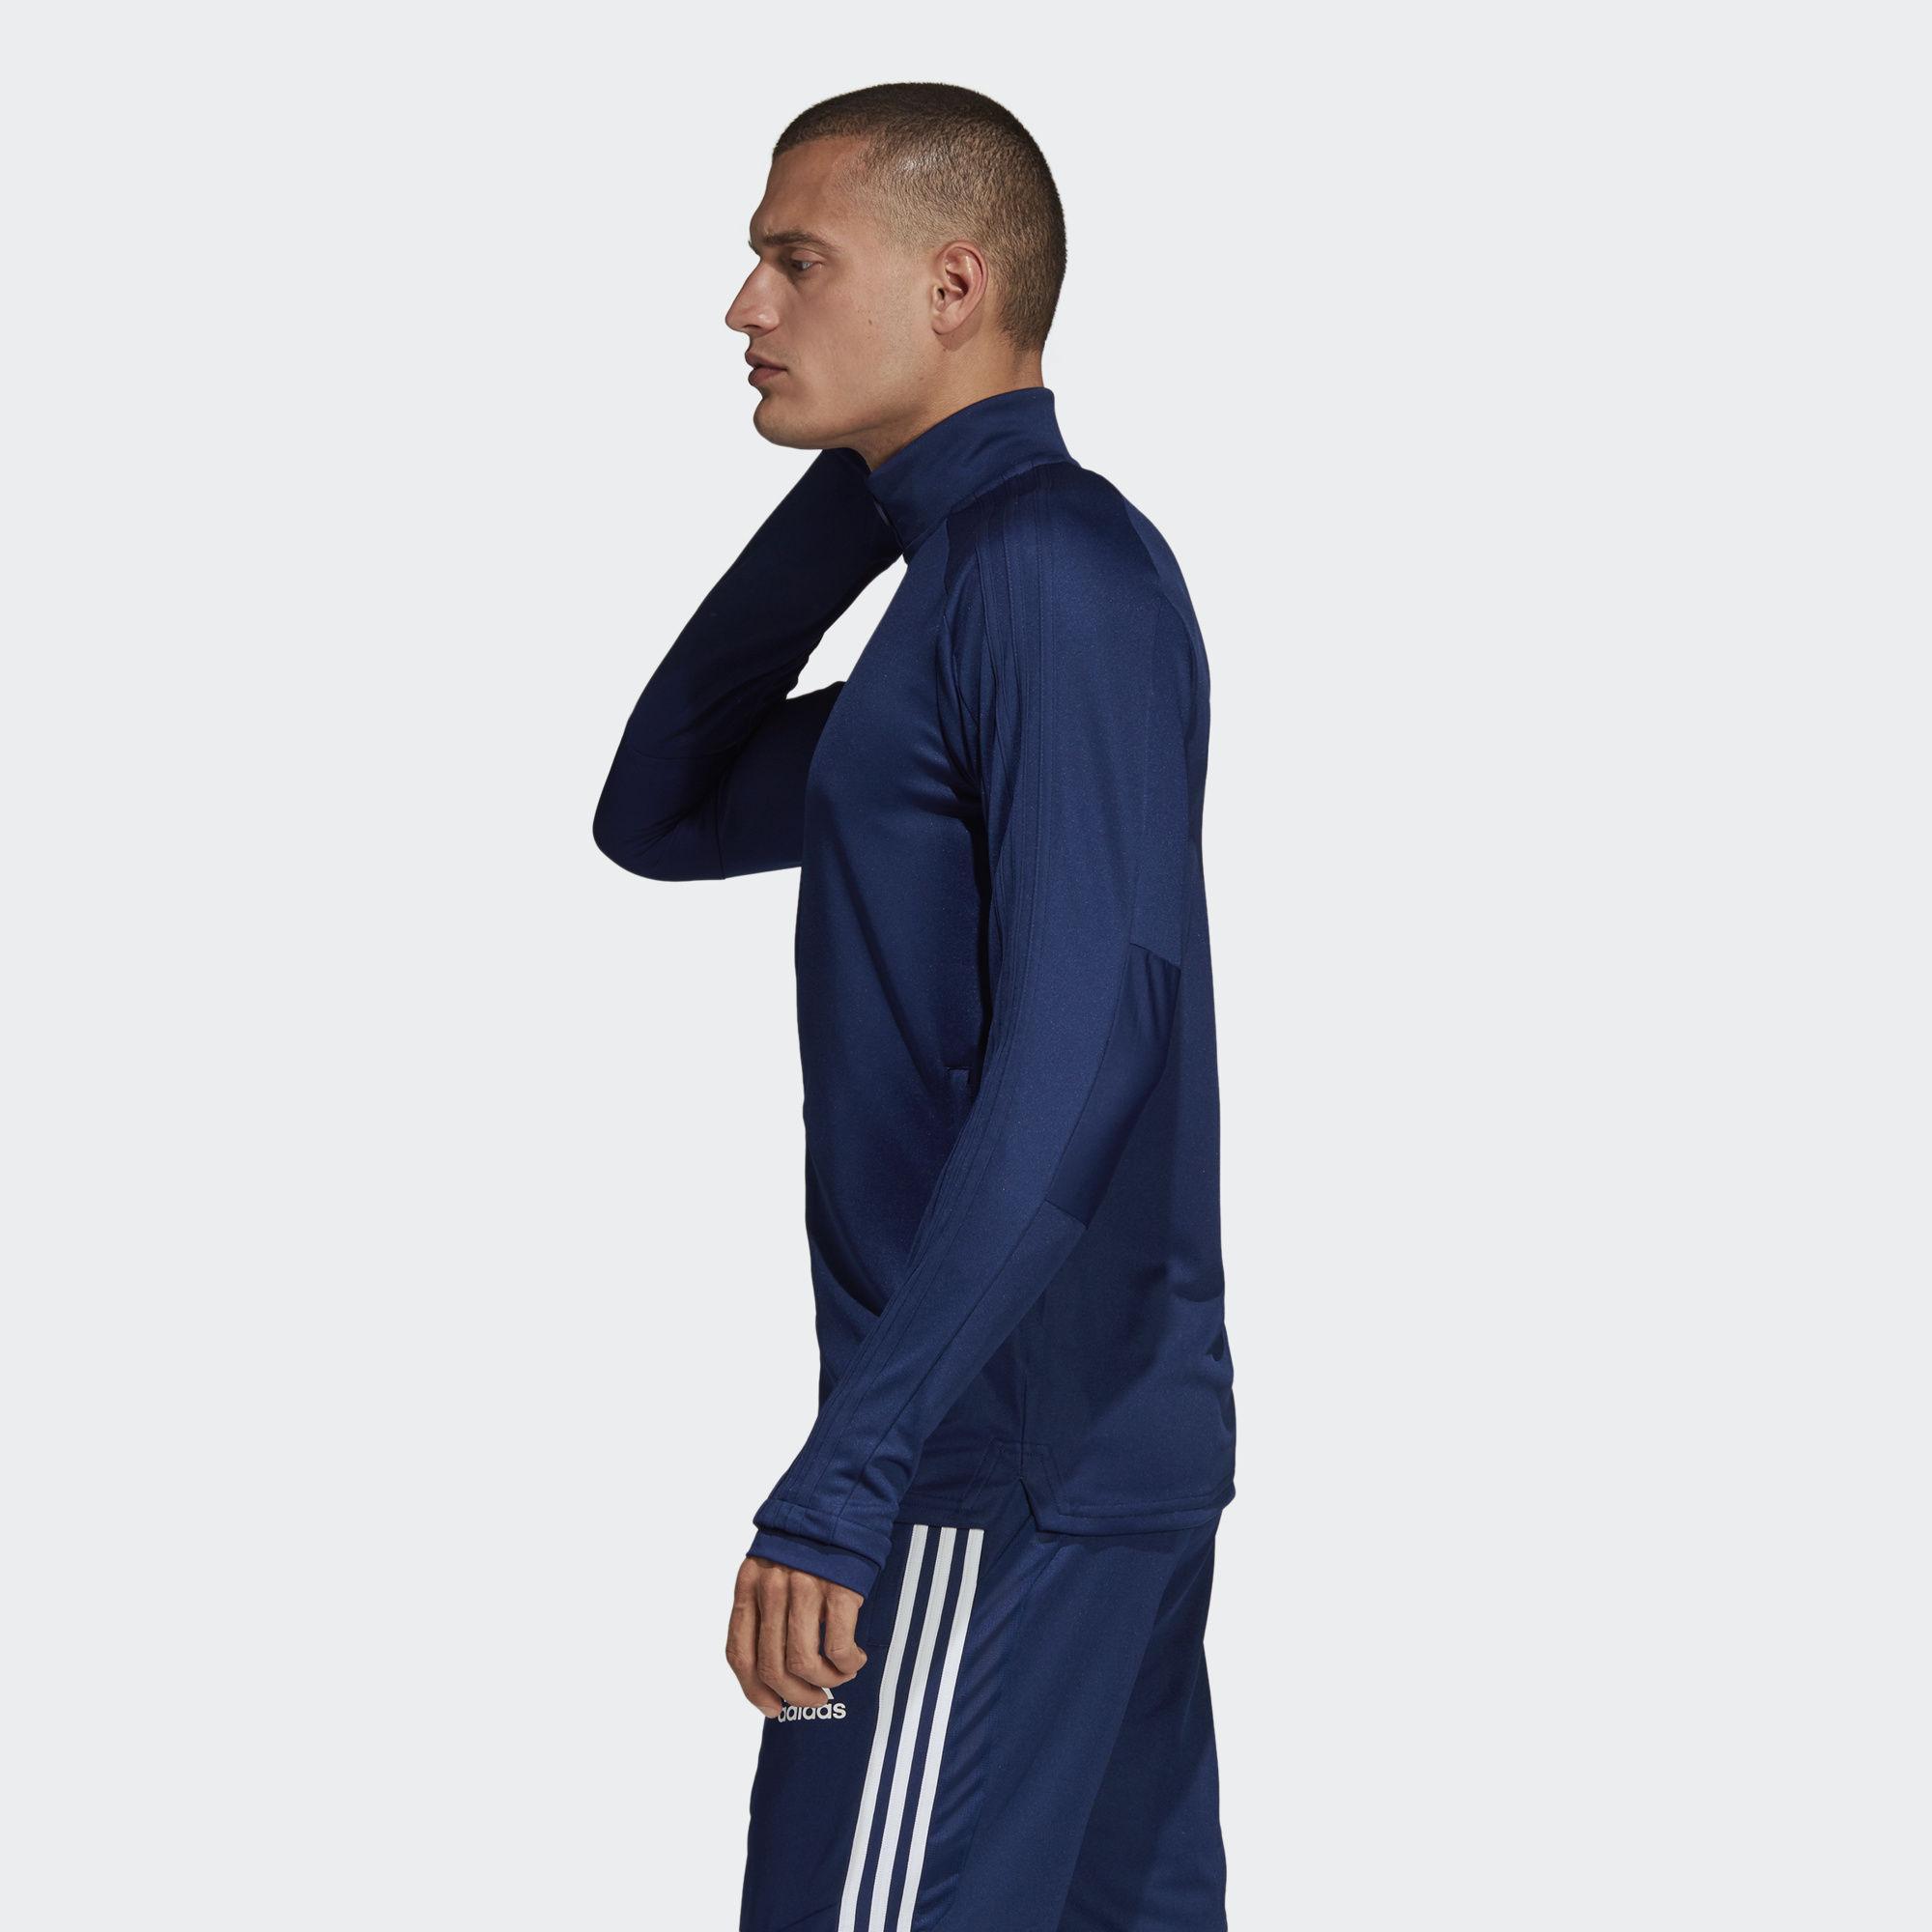 official photos 6729a 228d9 Adidas - Blue Condivo 18 Training Jacket for Men - Lyst. View fullscreen